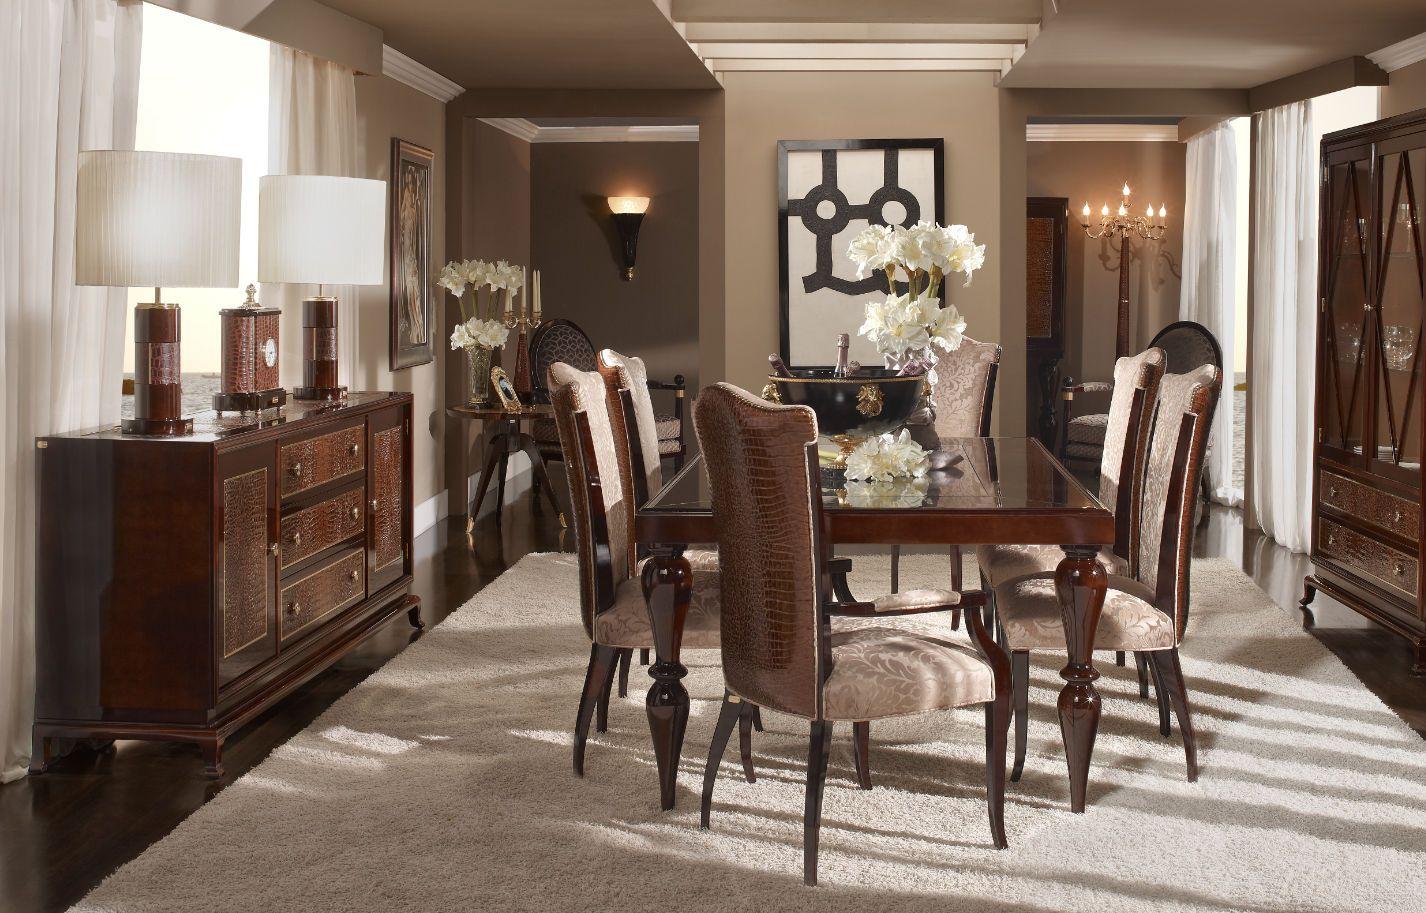 Comedores elegantes clasicos buscar con google molduras for Muebles de comedor elegantes